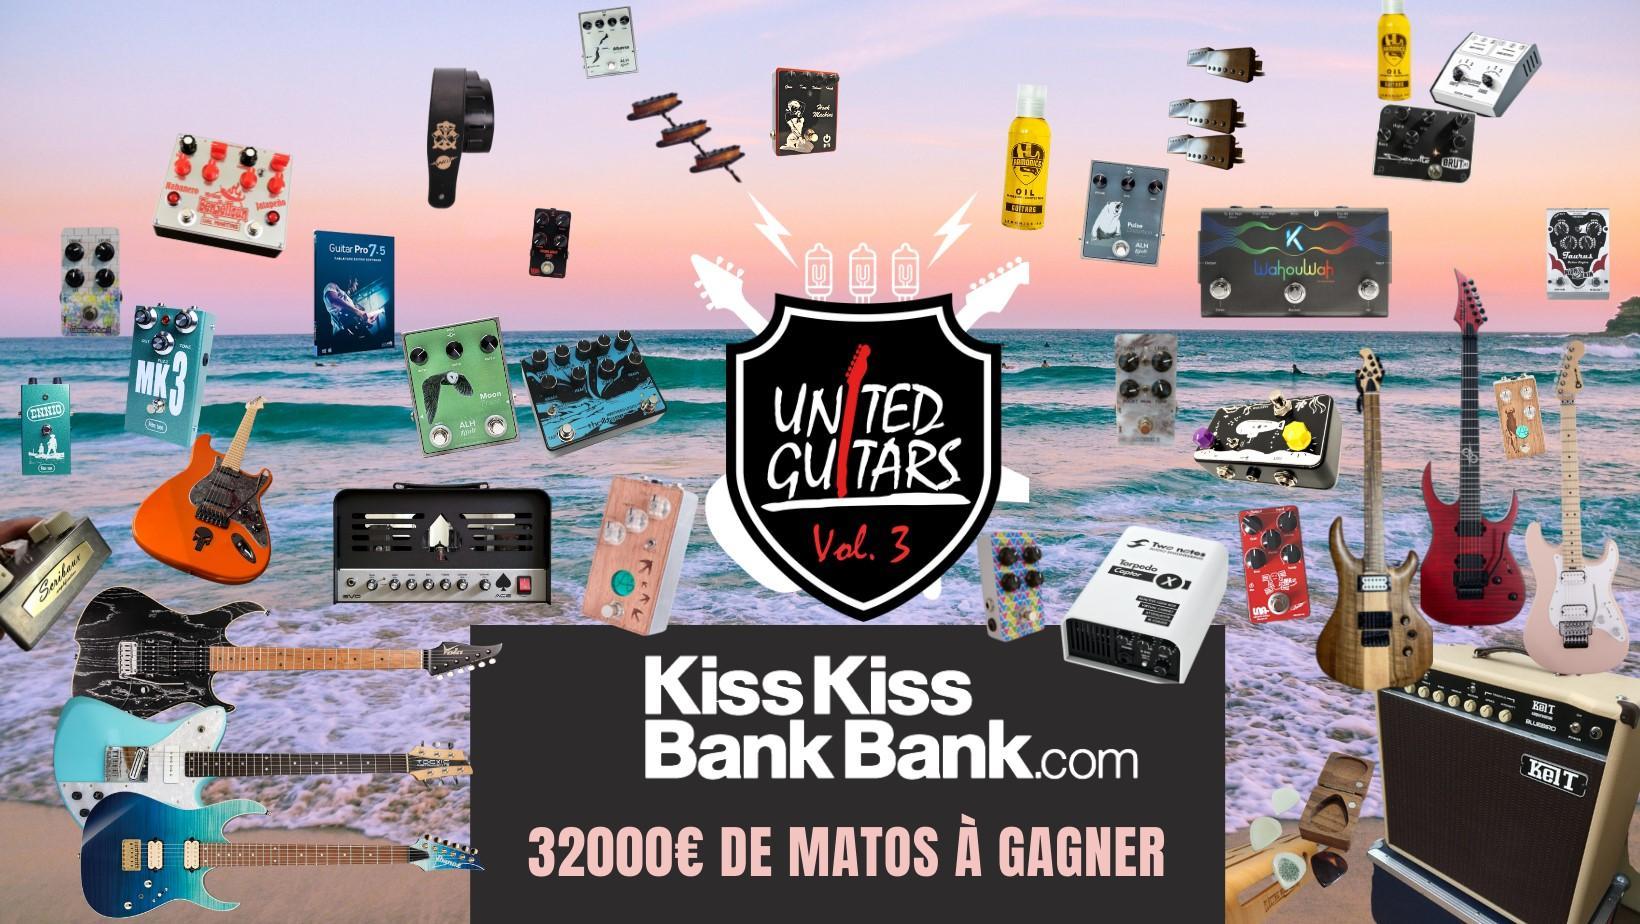 United guitars 2021 kkbb